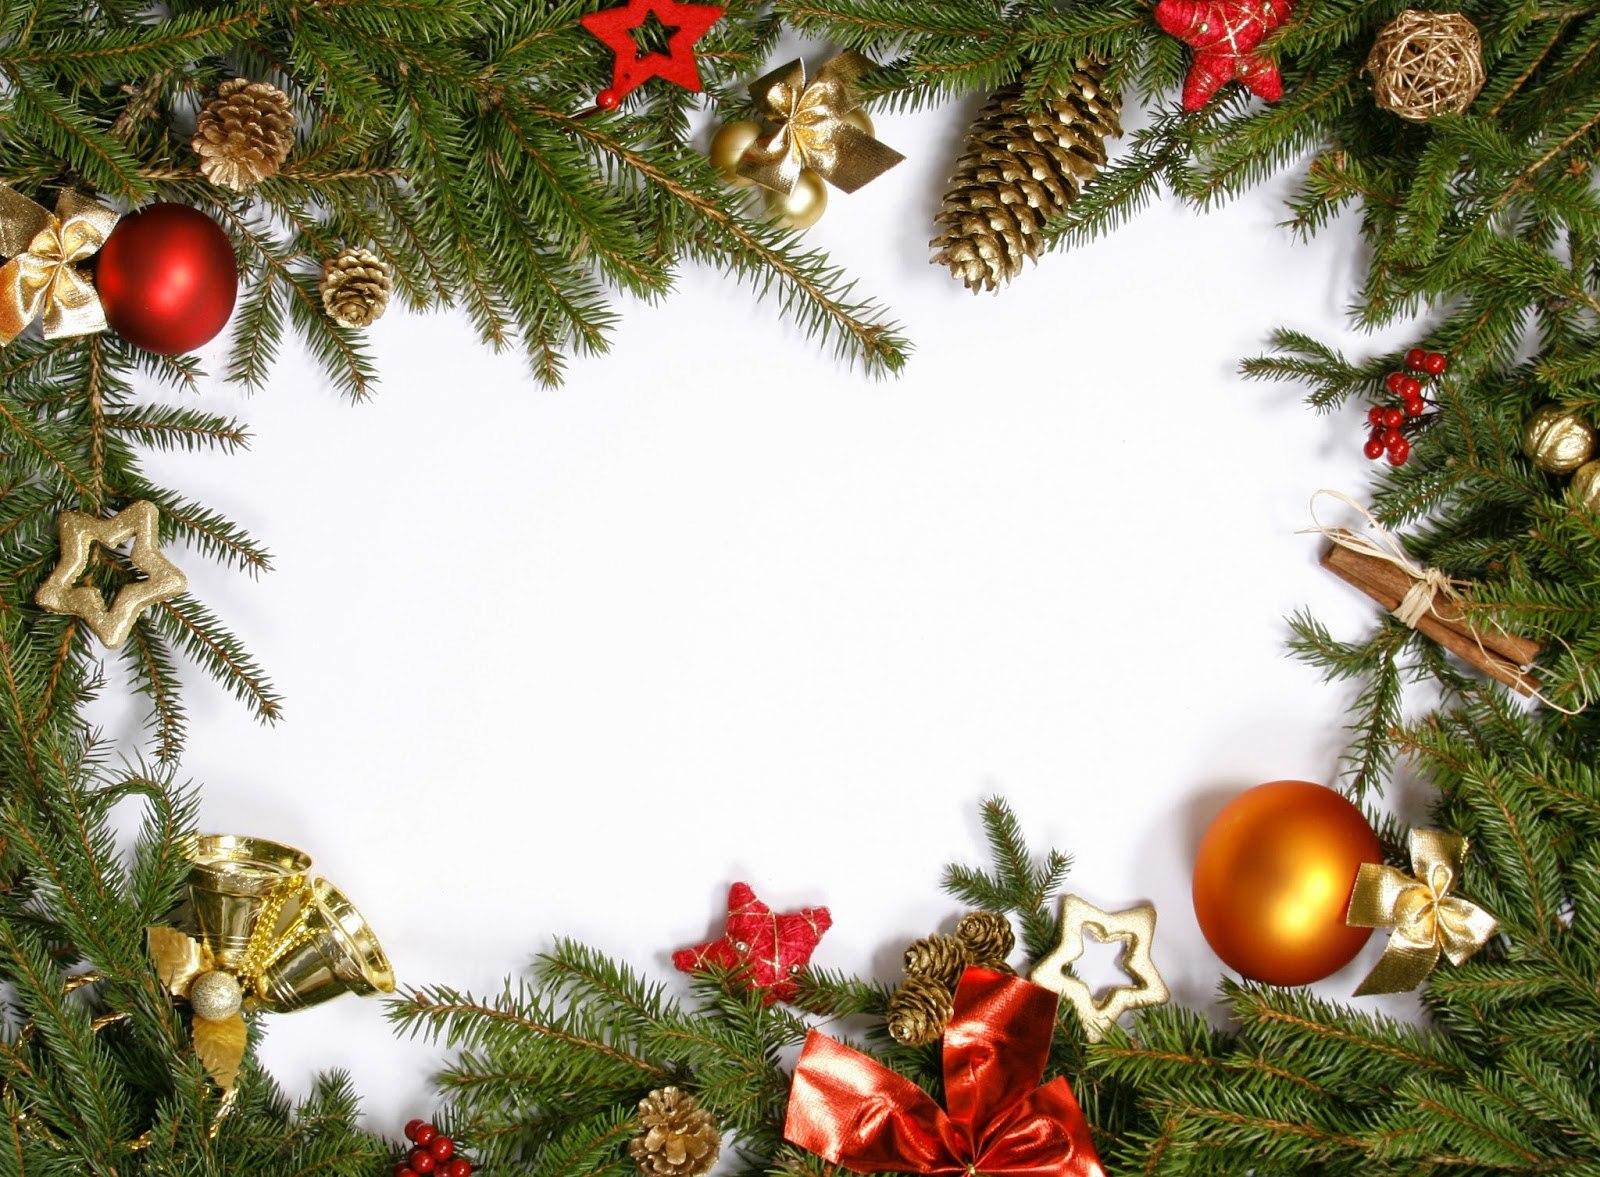 Christmas Card Templates For Photoshop Snowflakeredcard Template For Christmas Photo Card Templates Photoshop